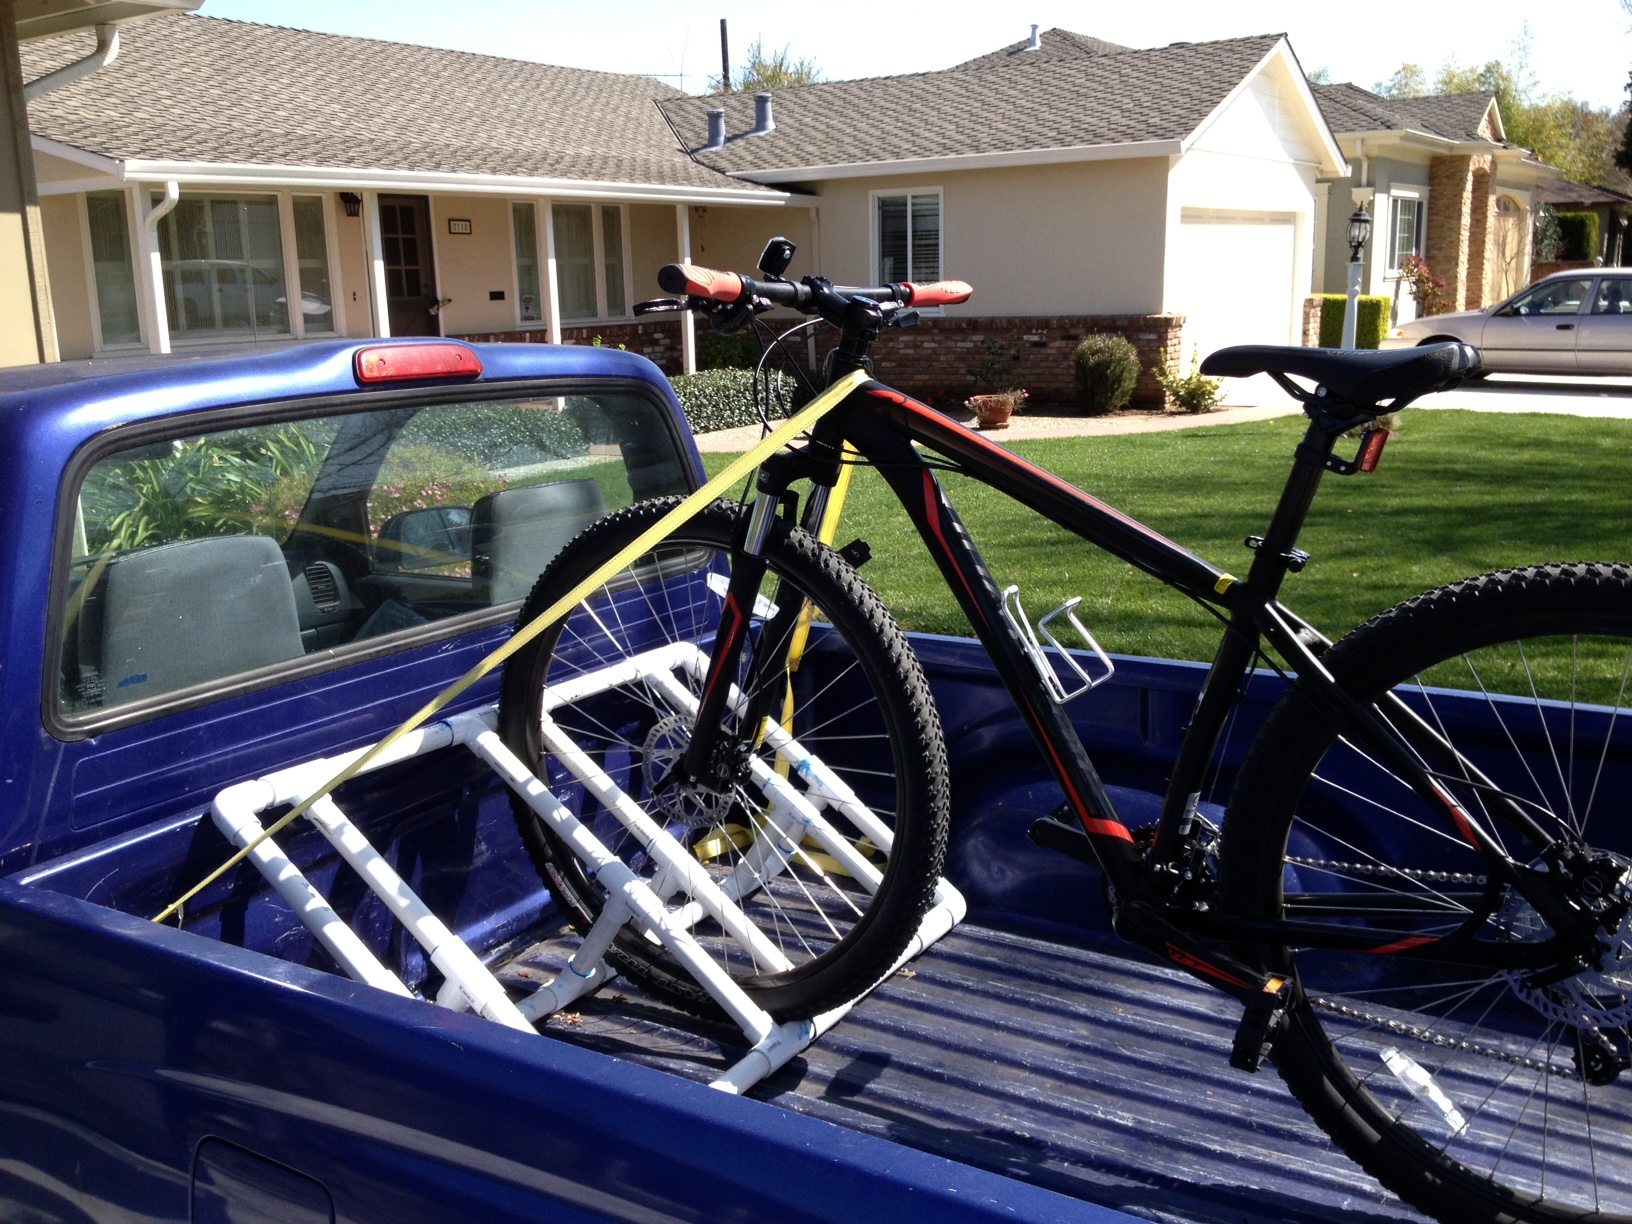 truckbed pvc bike rack 9 steps with